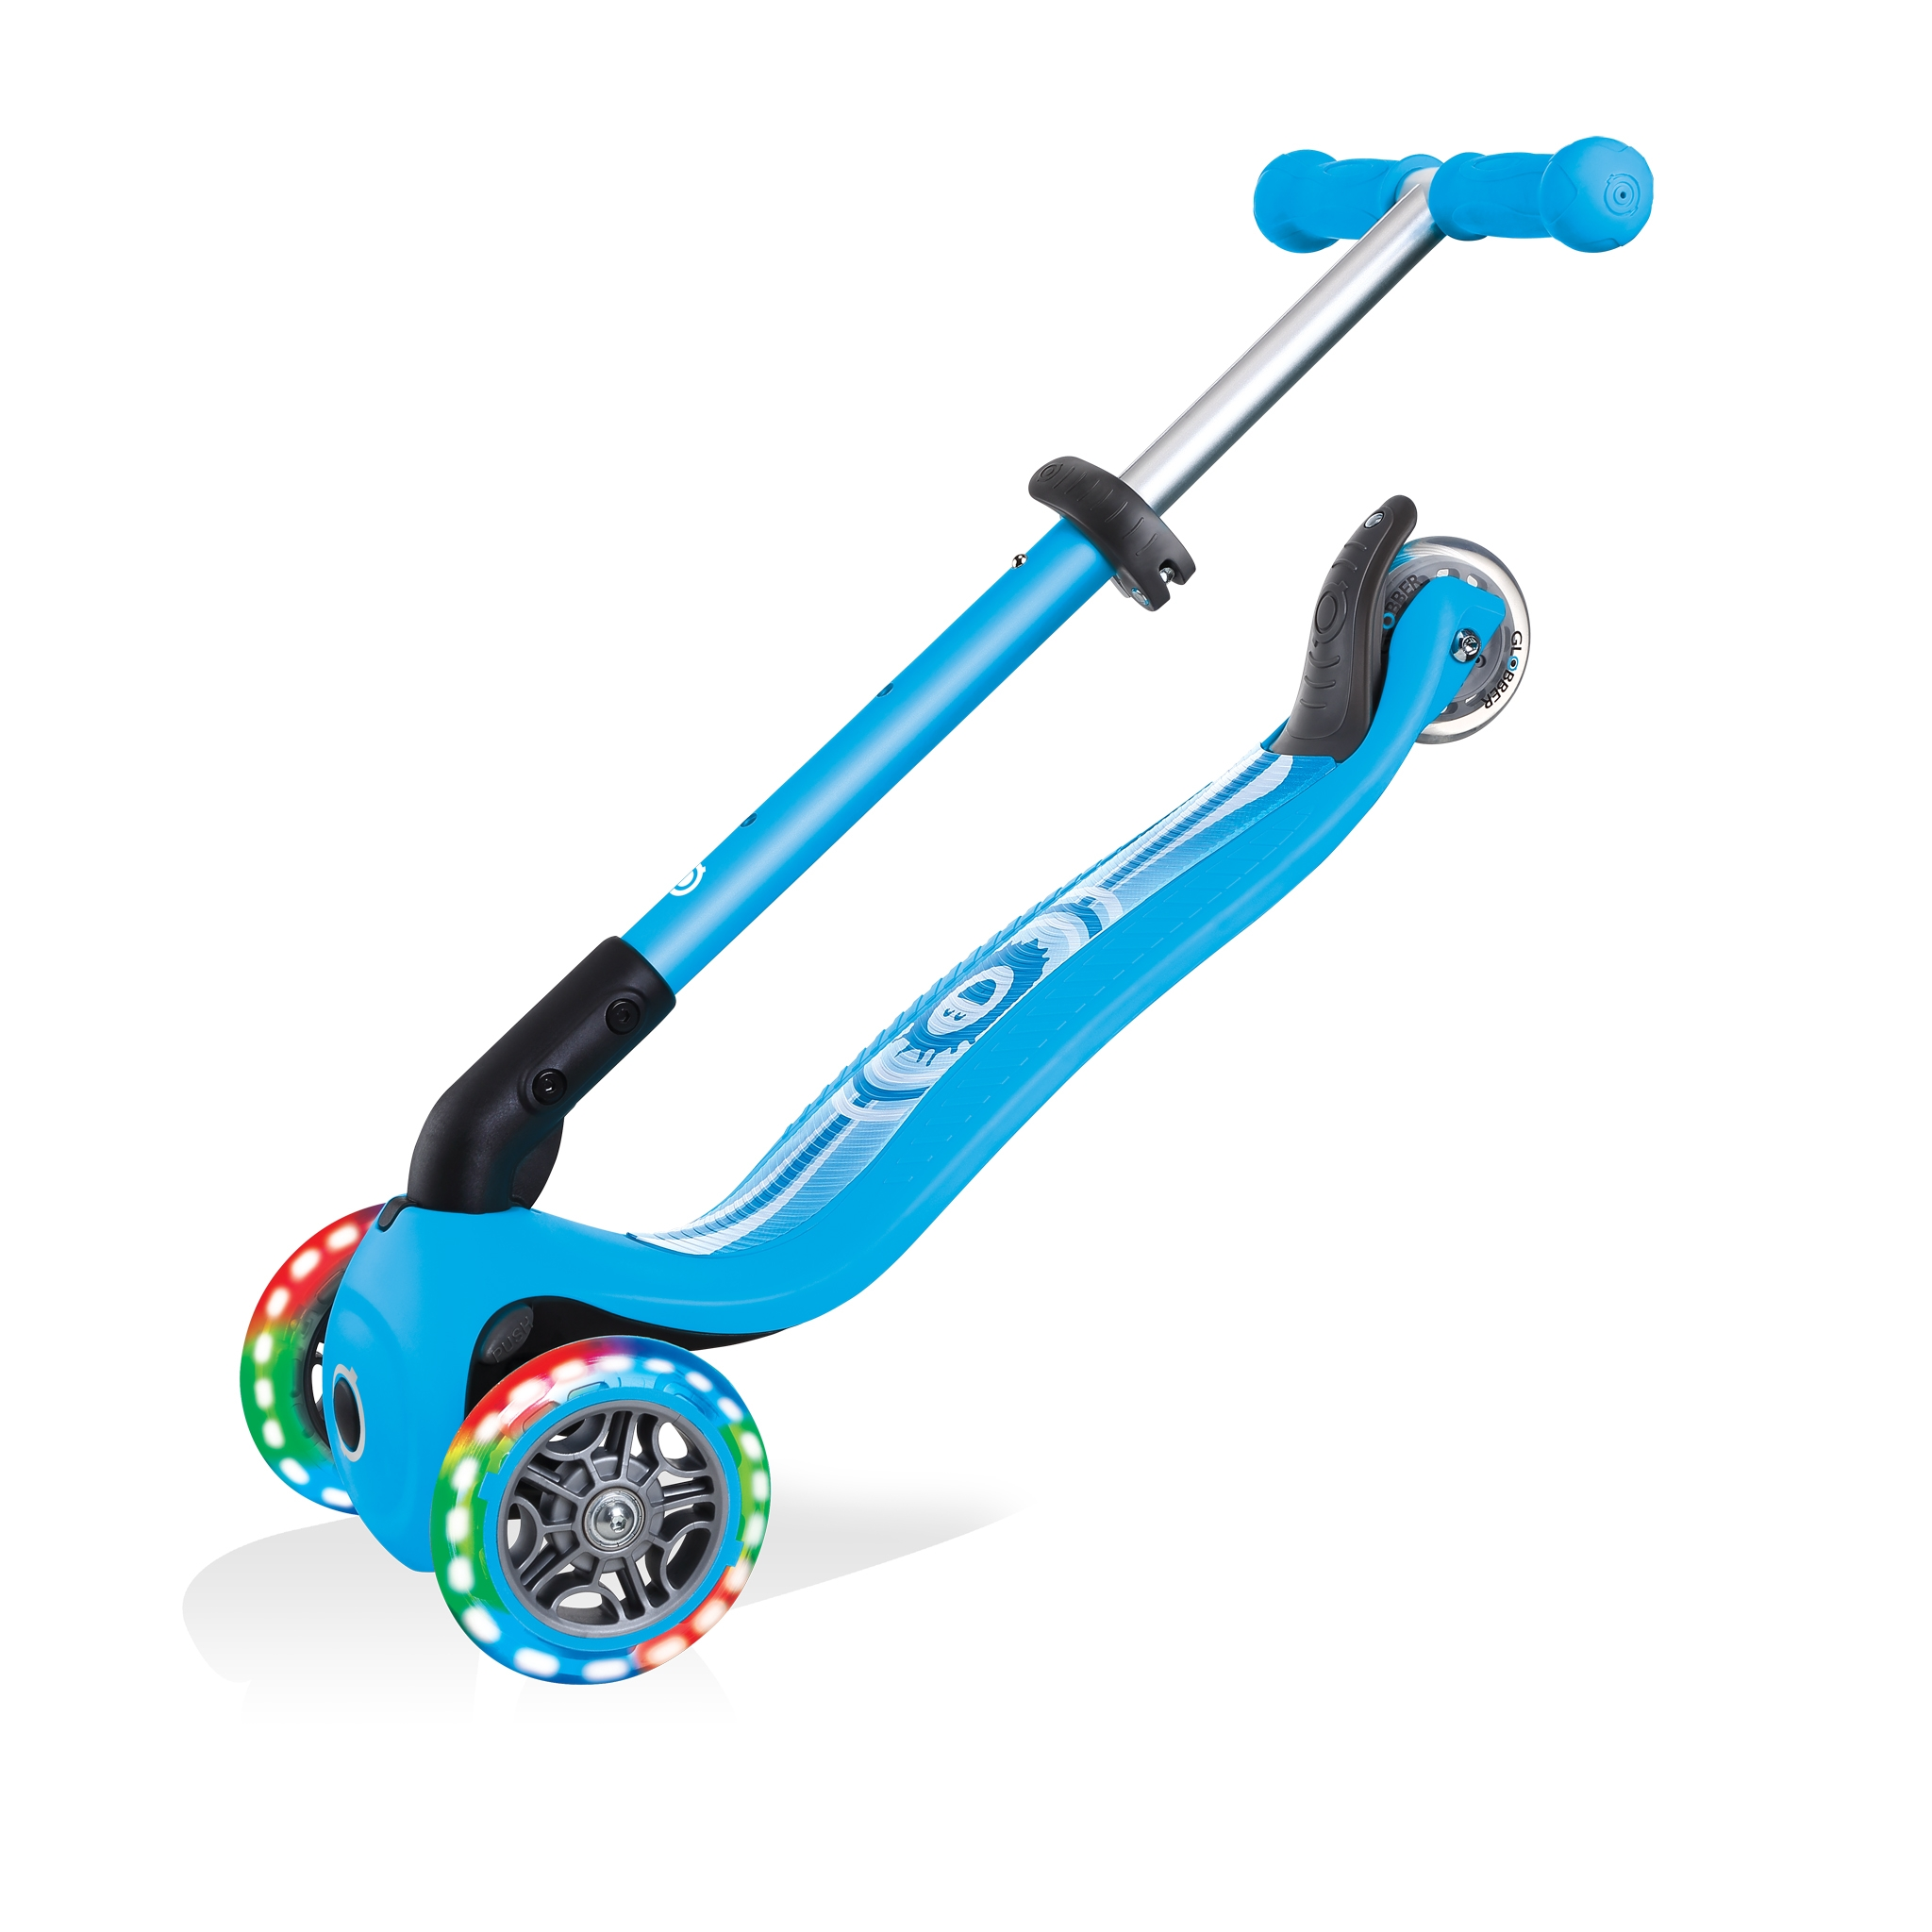 Foldable-3-wheel-toddler-scooter-Globber-JUNIOR-FOLDABLE-FANTASY-LIGHTS 5